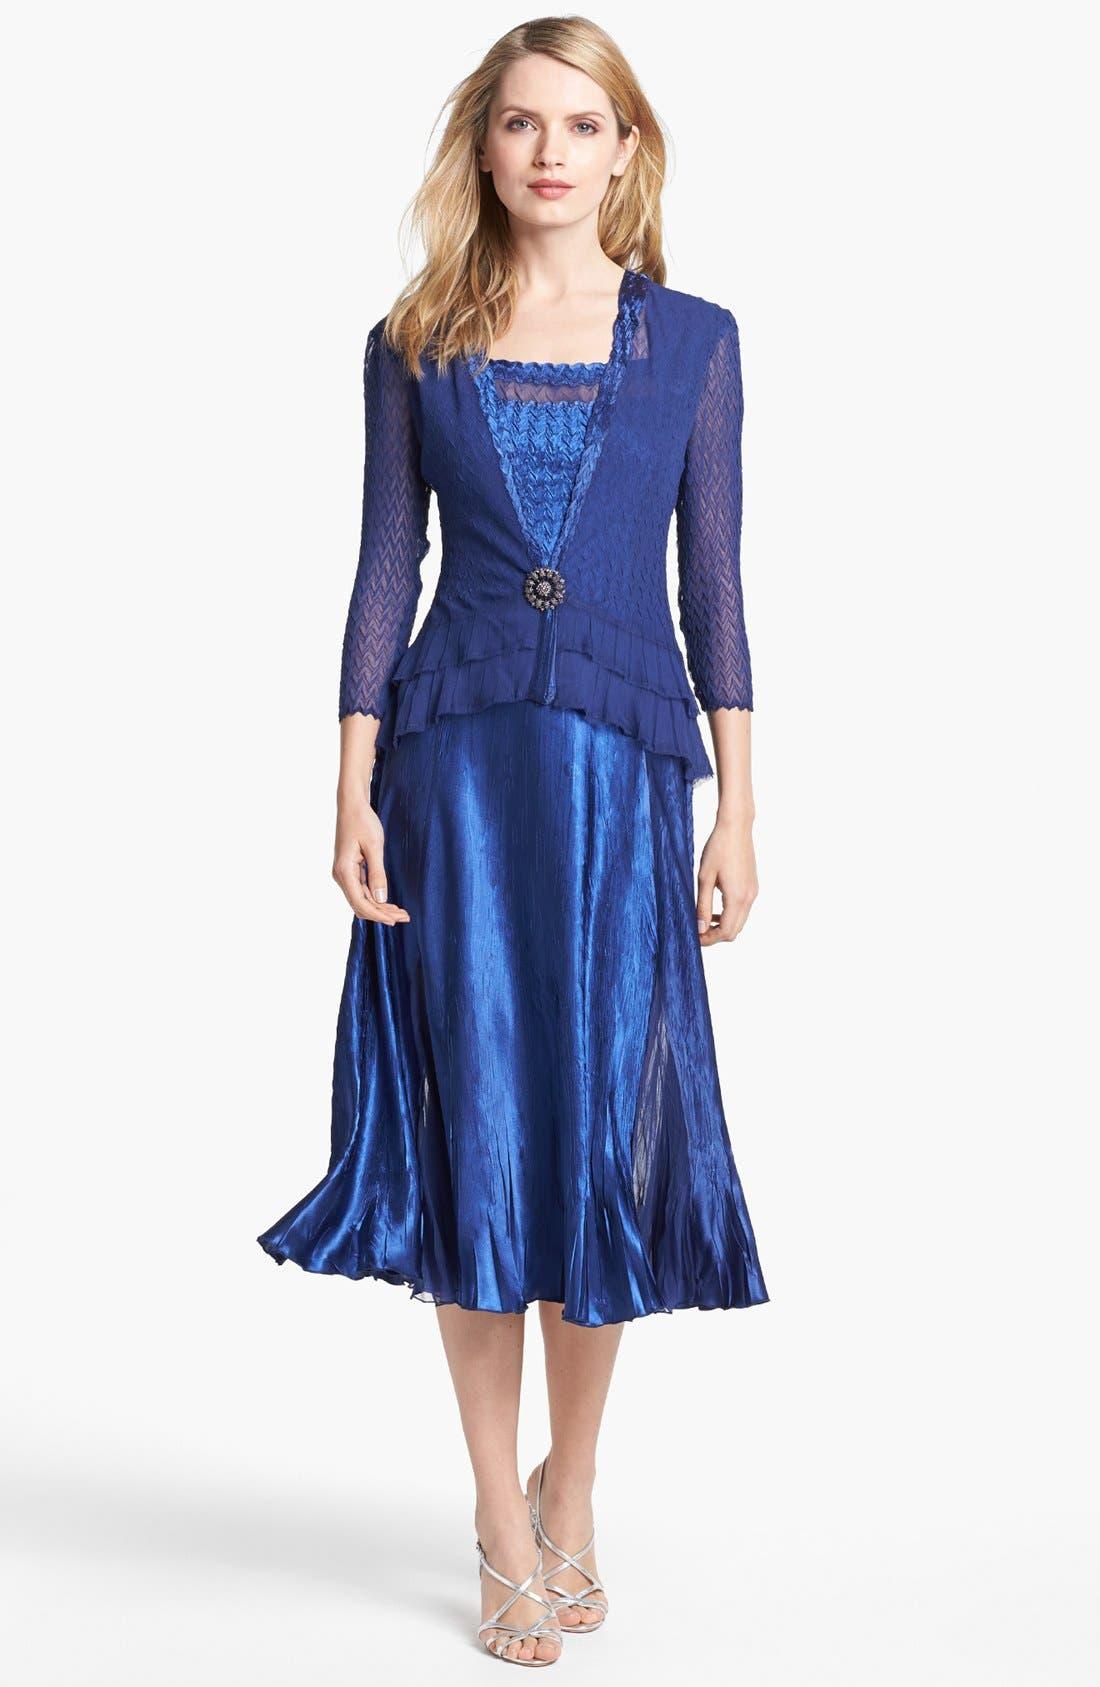 Alternate Image 1 Selected - Komarov Textured Satin Dress & Jacket